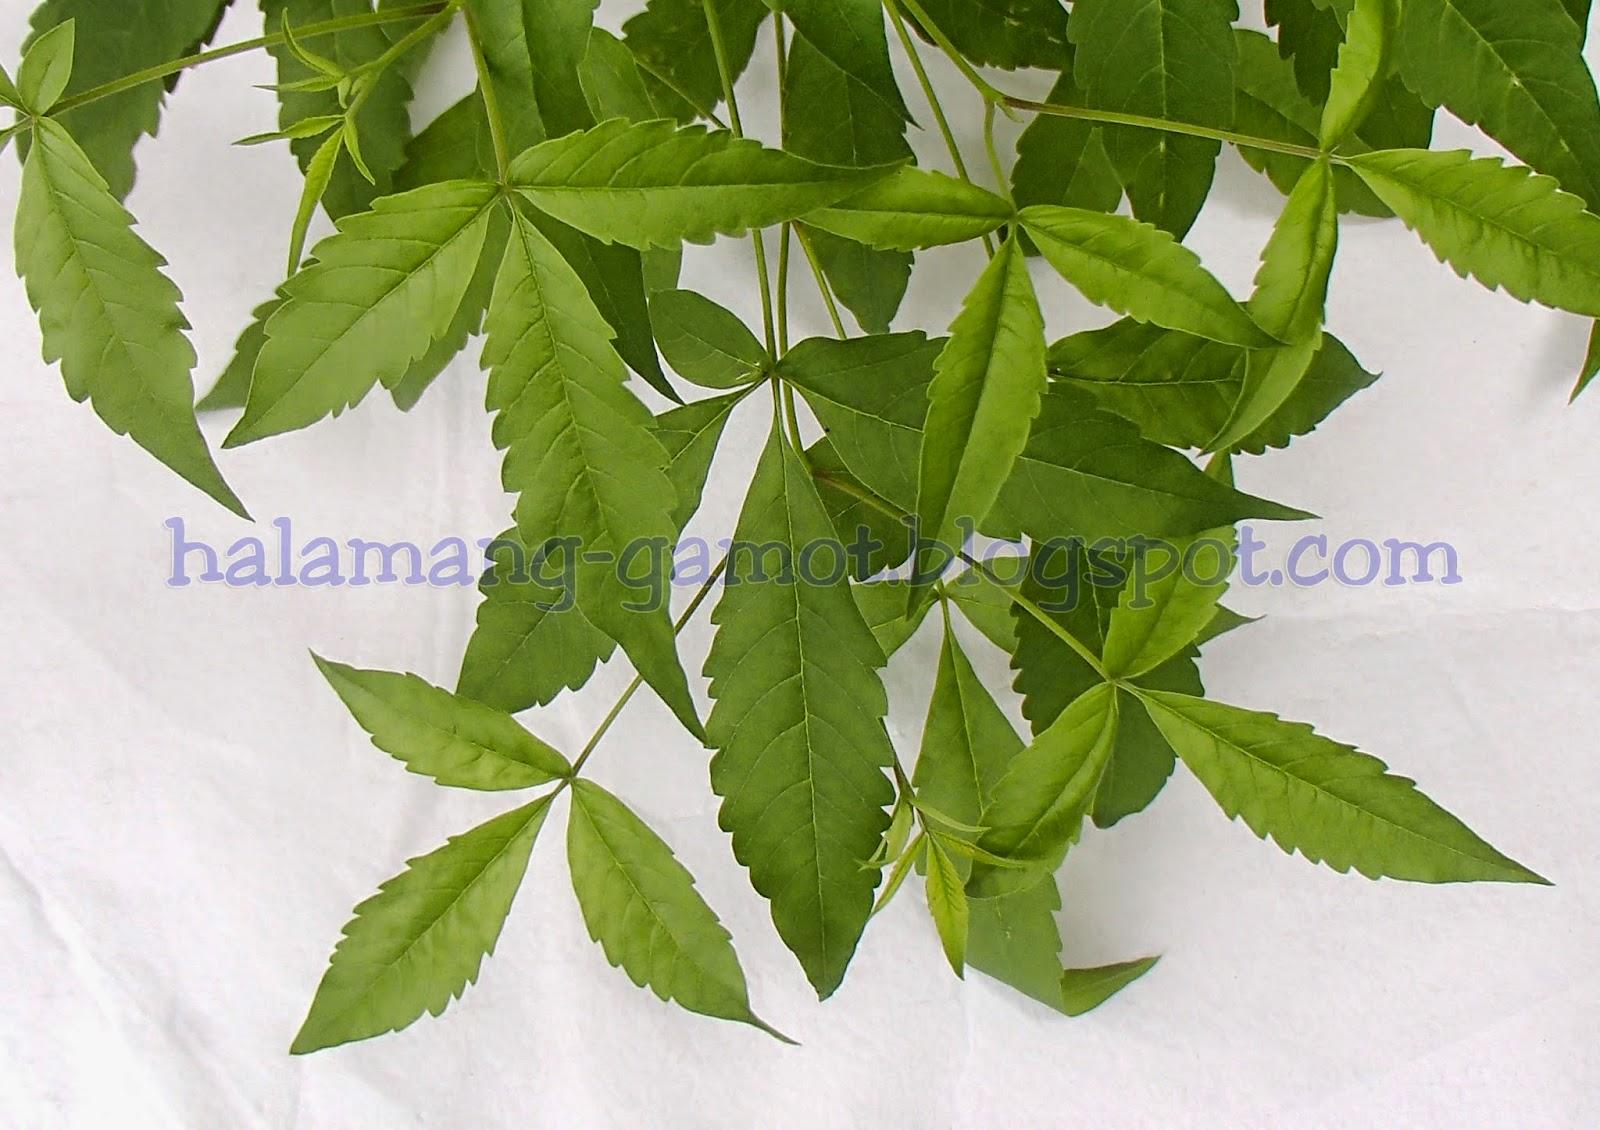 Lagundi plant